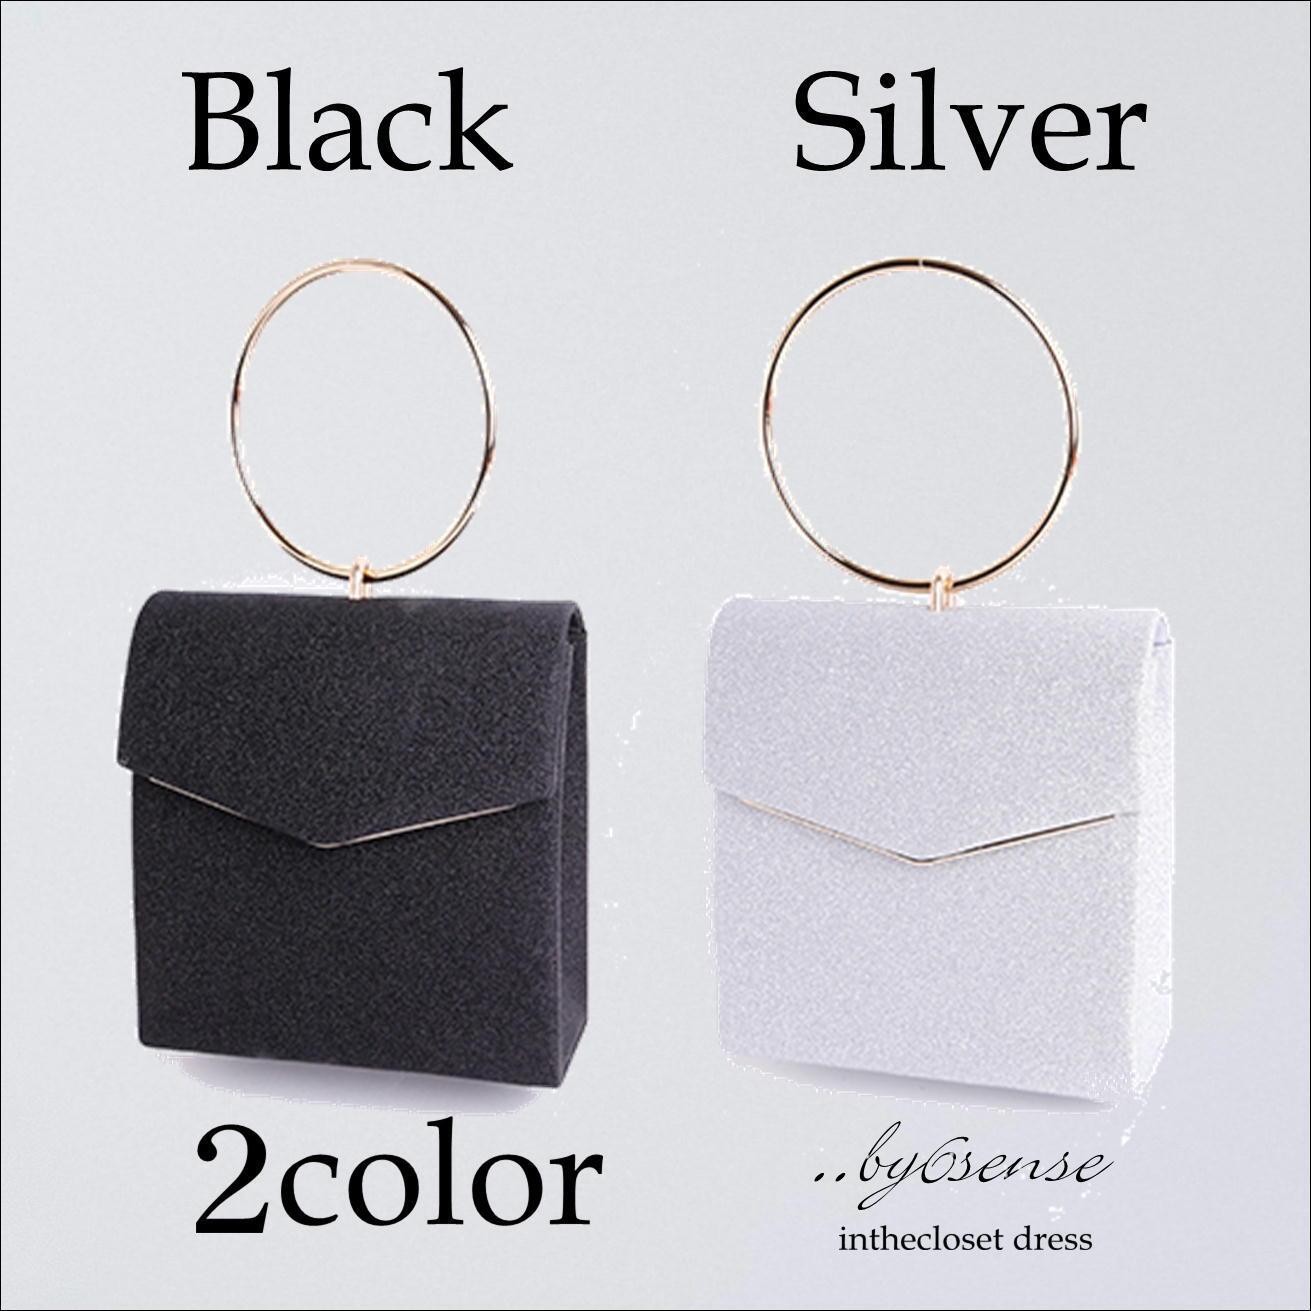 2color リングデザインボックス型 パーティバック 【浜松ドレスショップ..by6sense】